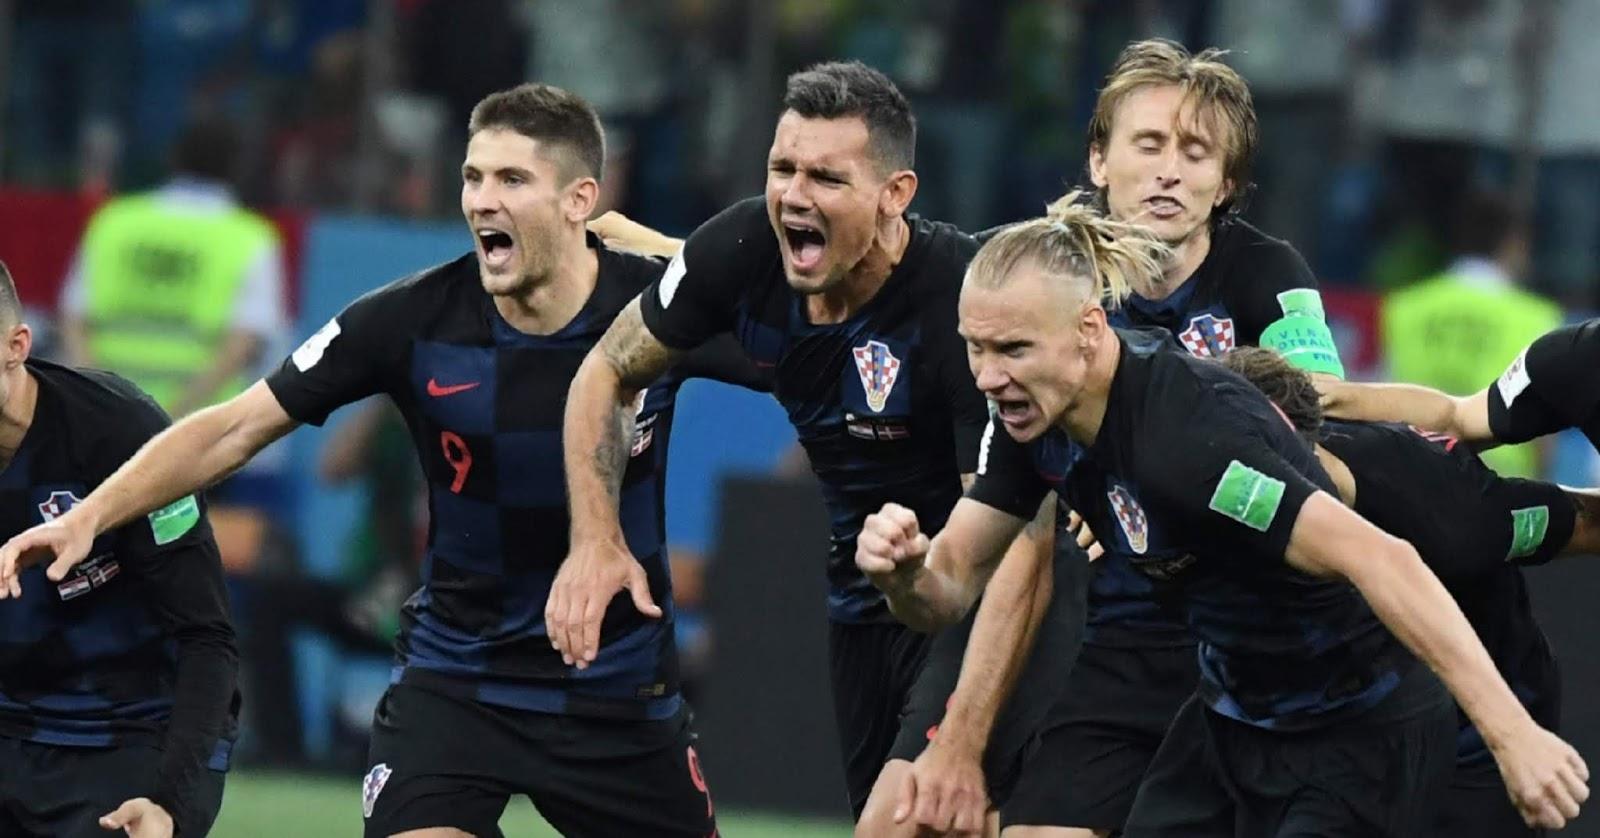 WORLD CUP, CROATIA